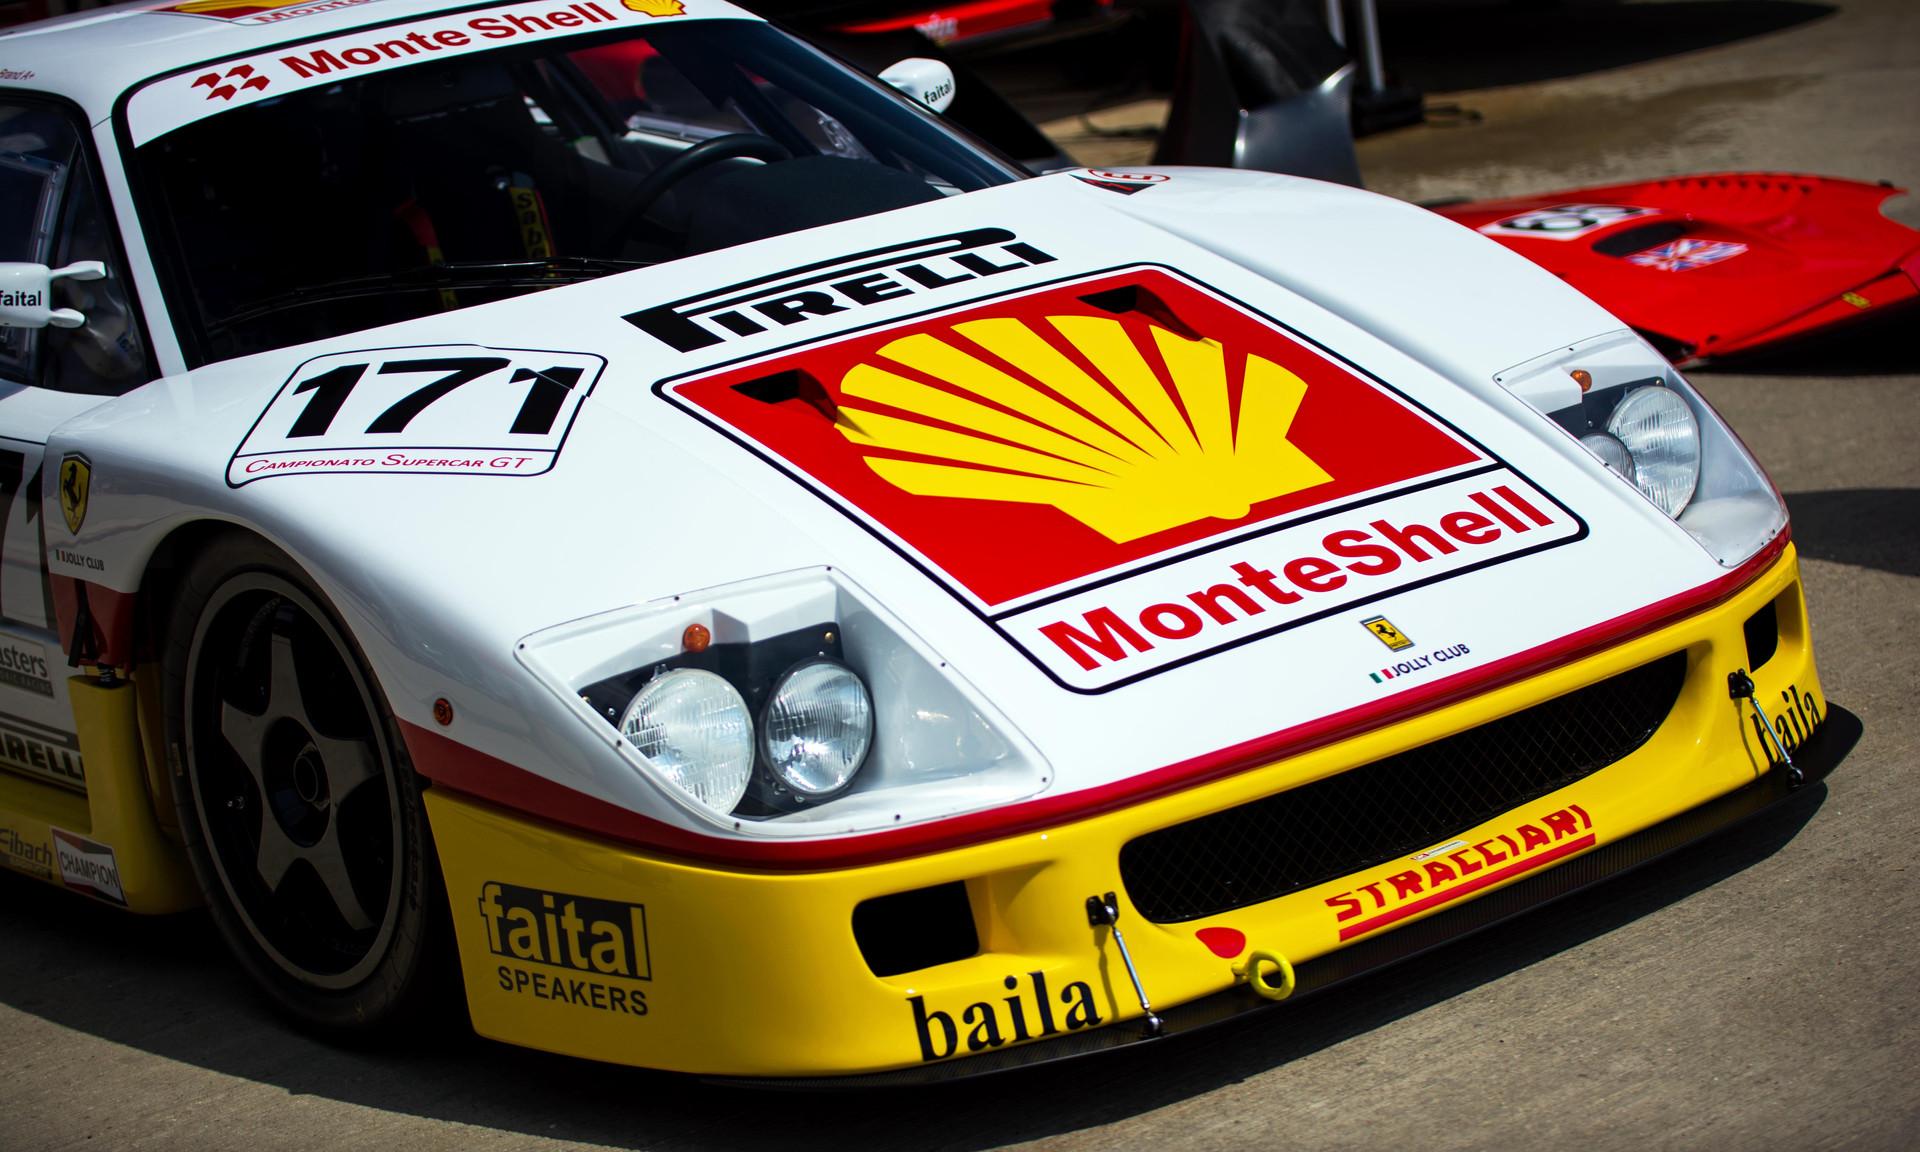 Steven Read's 1995 Ferrari F40 GTE at th